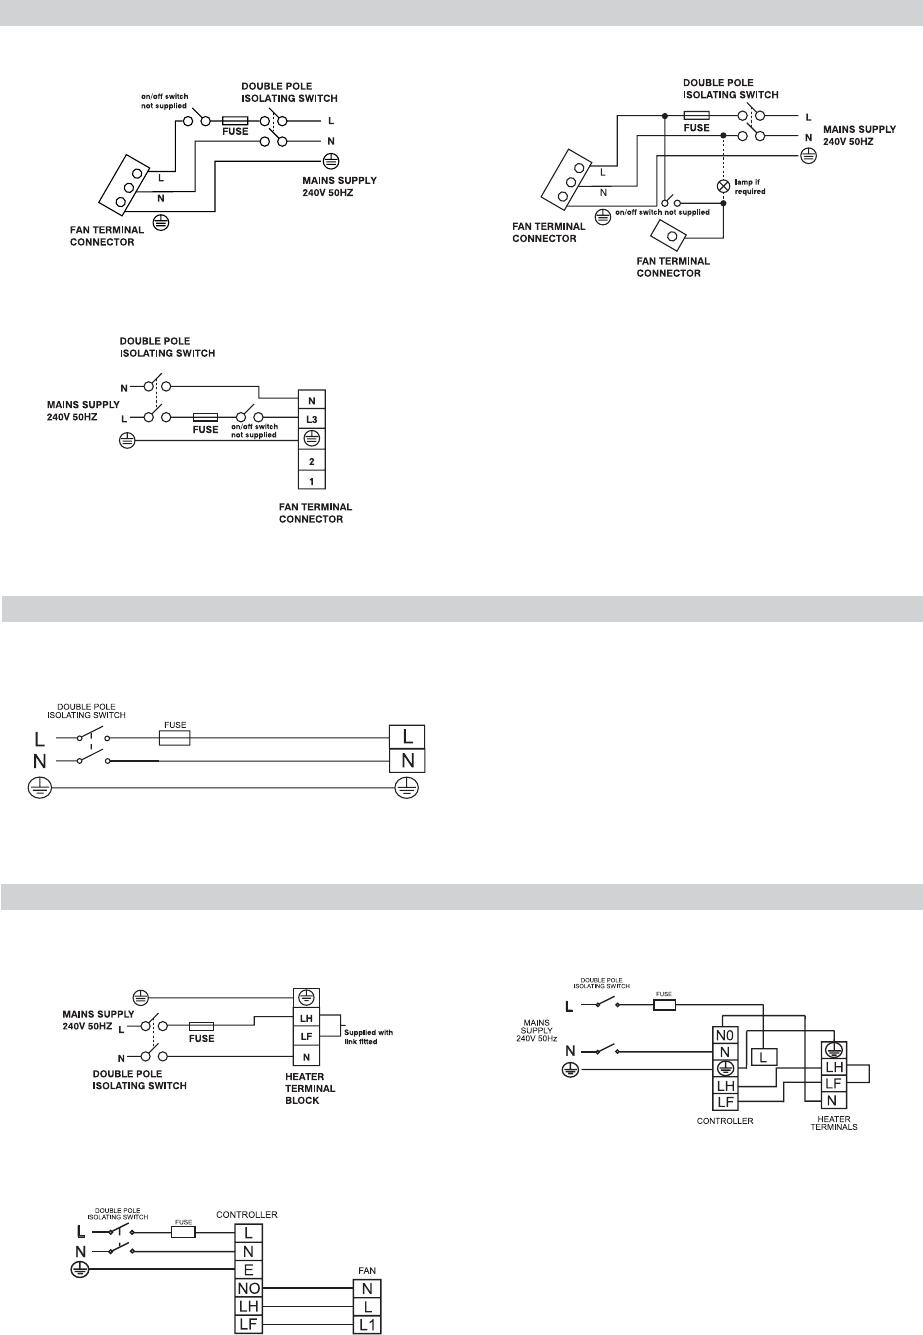 Pleasant 21241 Dom Text Xim150T Xp Wiring Wiring Digital Resources Attrlexorcompassionincorg